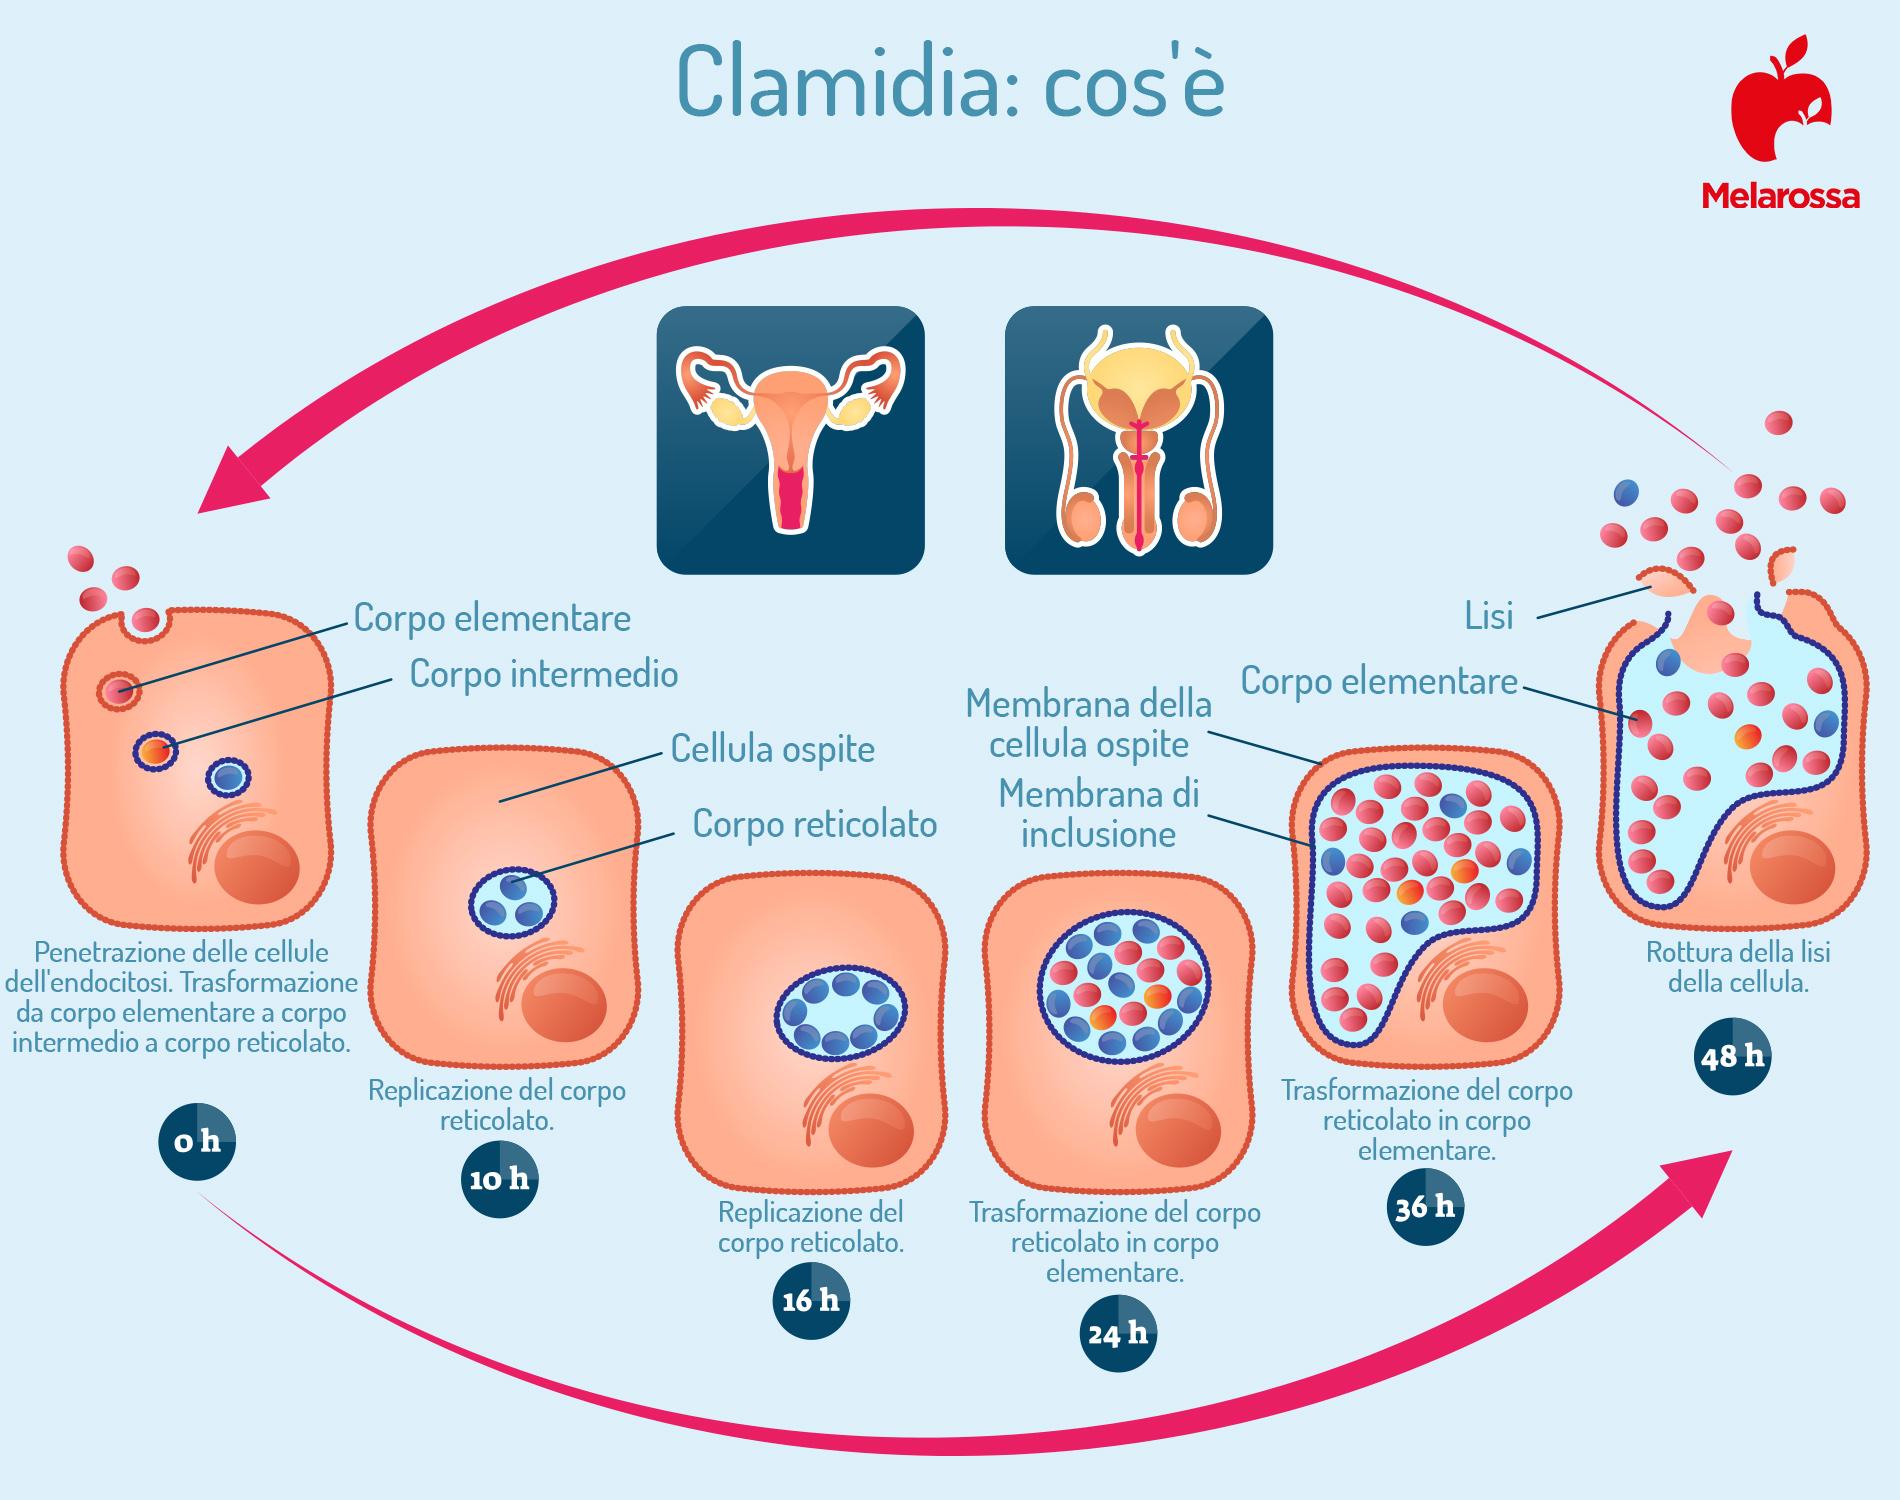 clamidia: cos'è